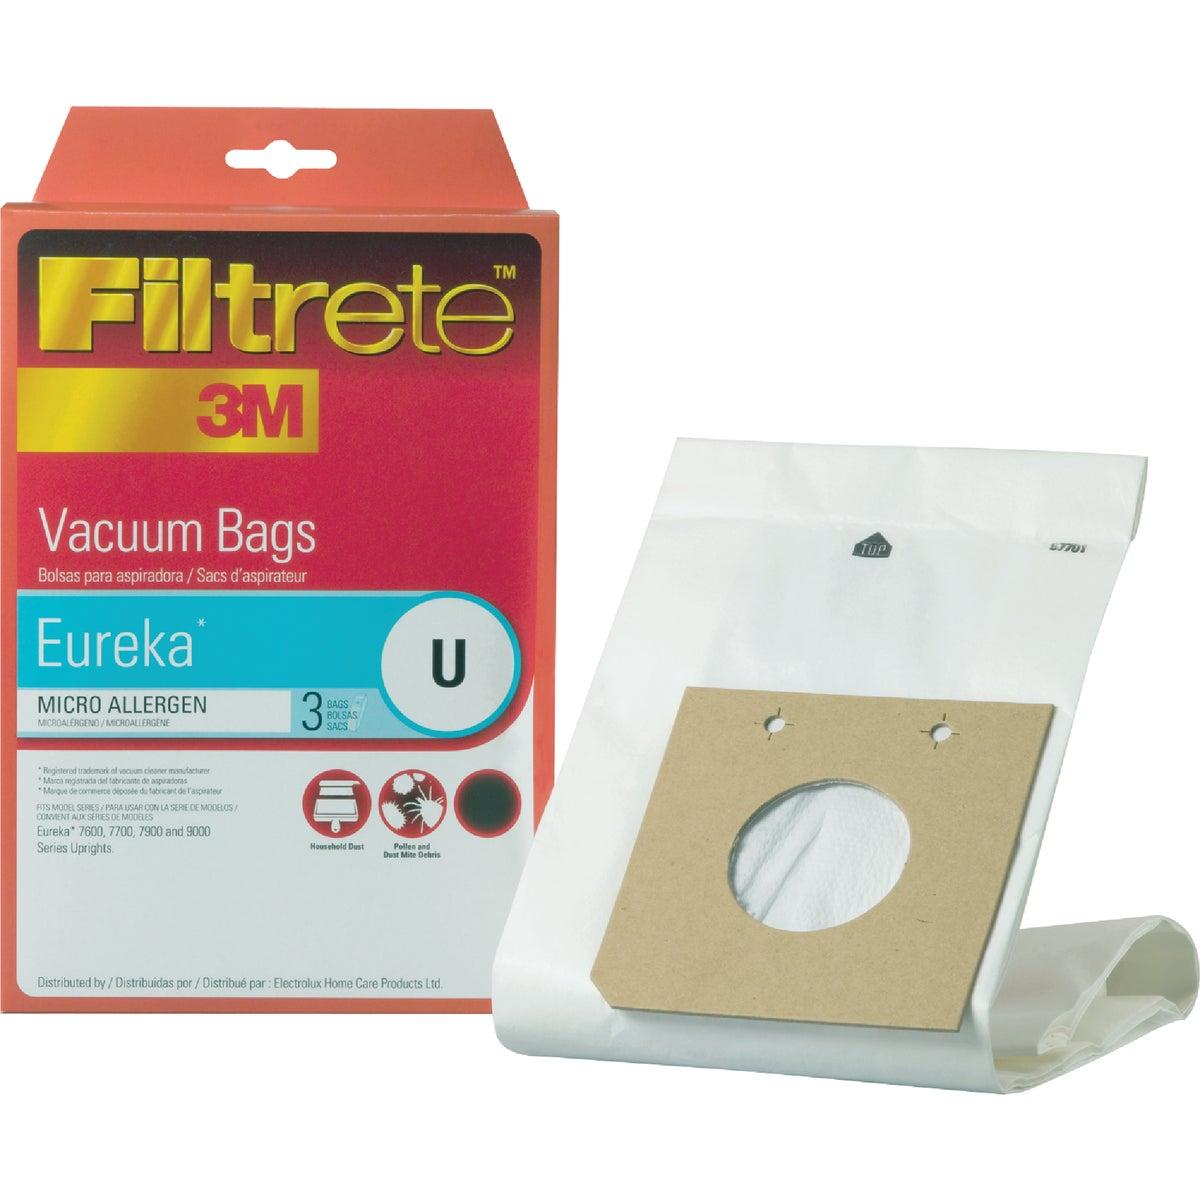 3M Filtrete Eureka Type U Micro Allergen Vacuum Bag (3-Pack)